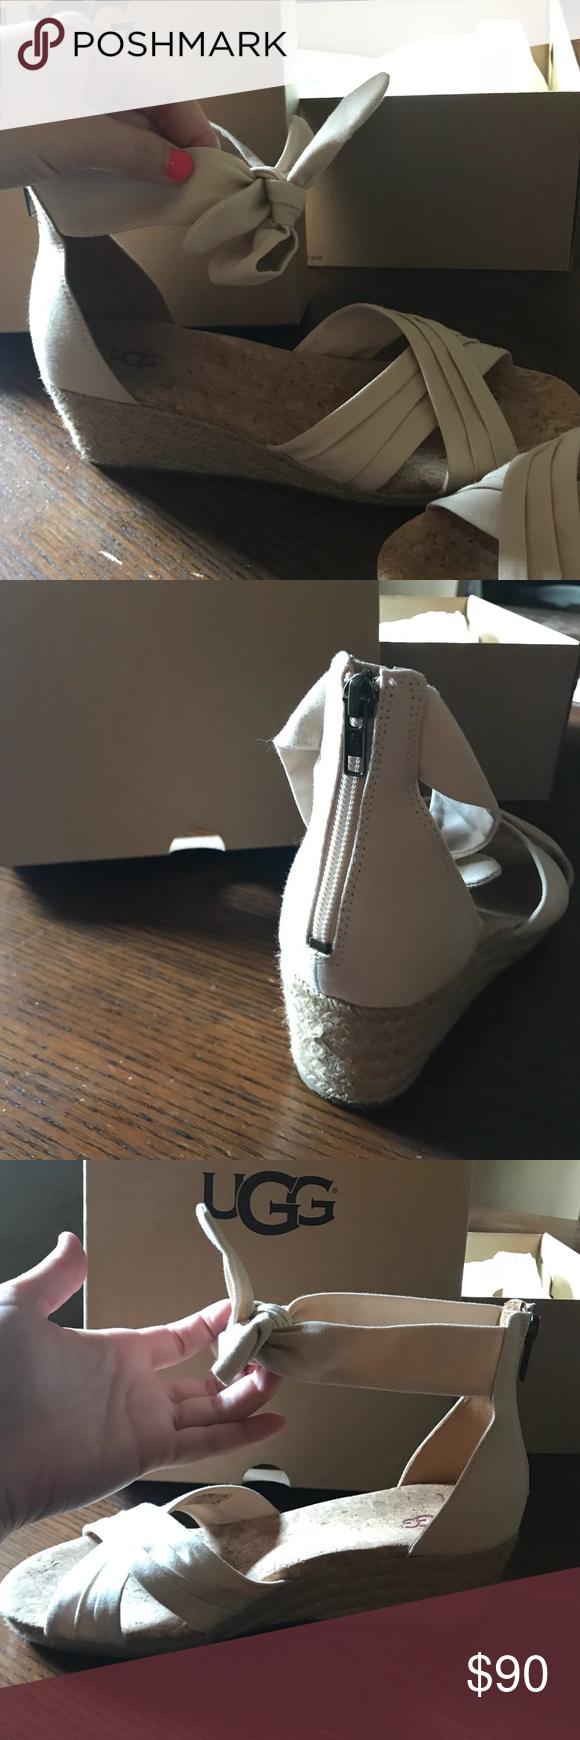 2bdf84558c8 UGG Shoes | Ugg Womens Traci Espadrille Wedge Sandals | Color: Cream ...